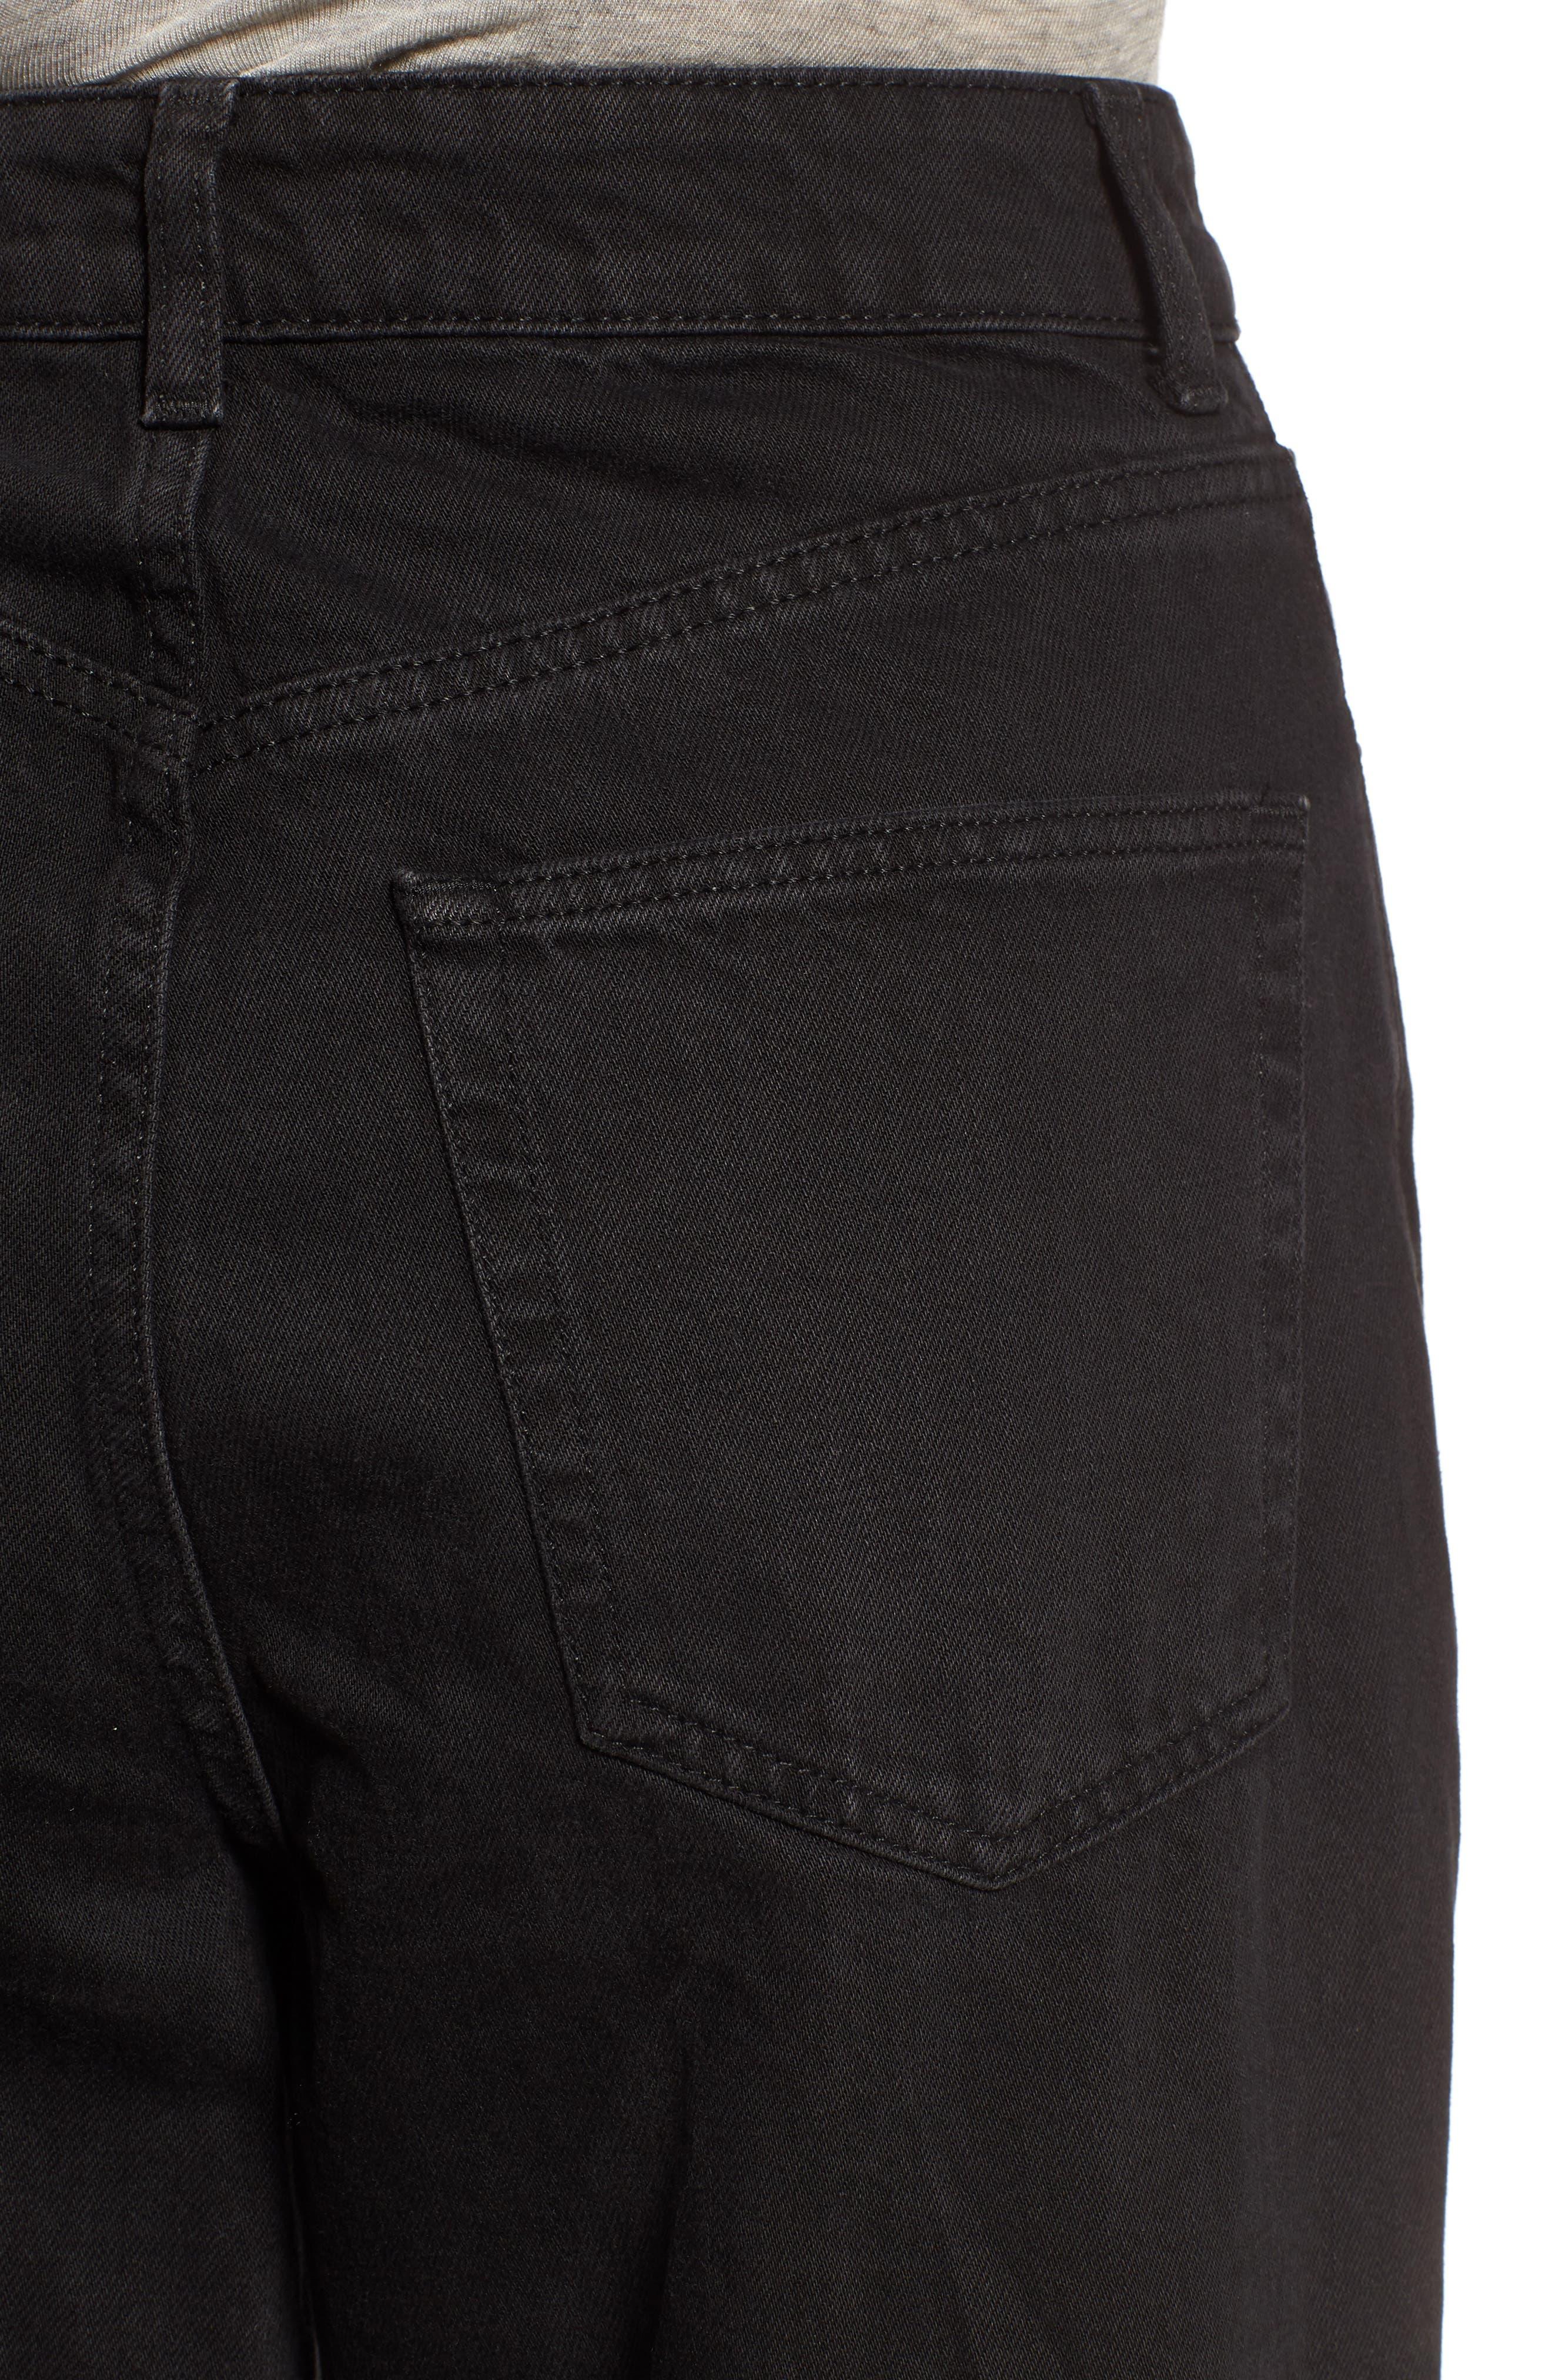 TOPSHOP, Wide Leg Crop Jeans, Alternate thumbnail 5, color, WASHED BLACK